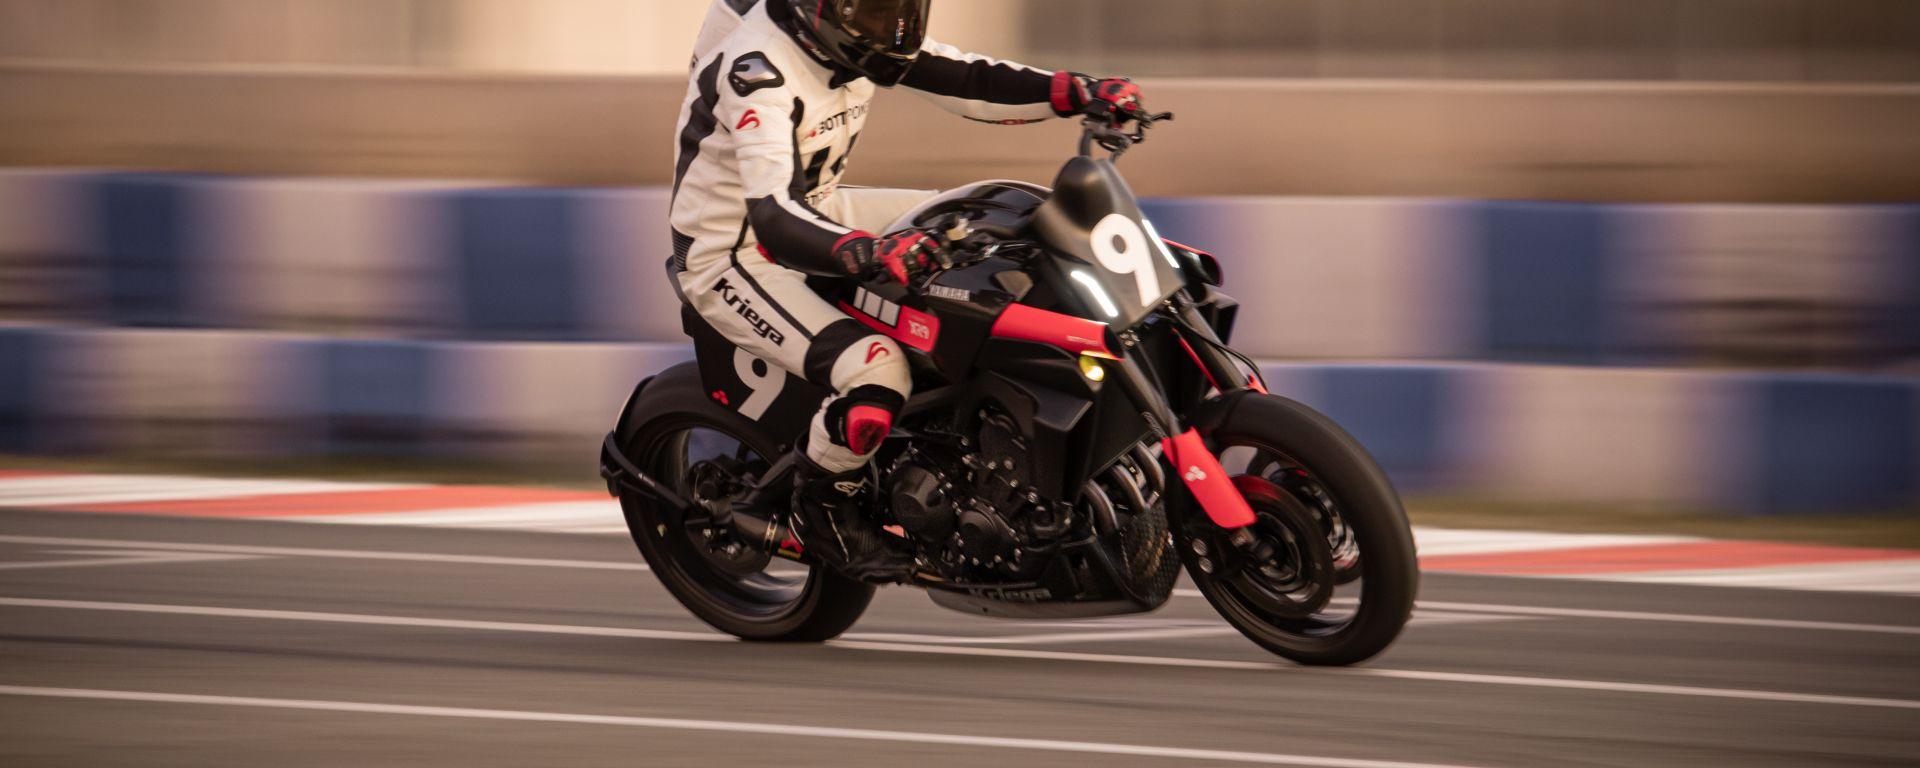 XR9 Carbona Bottpower: la special per la Pikes Peak